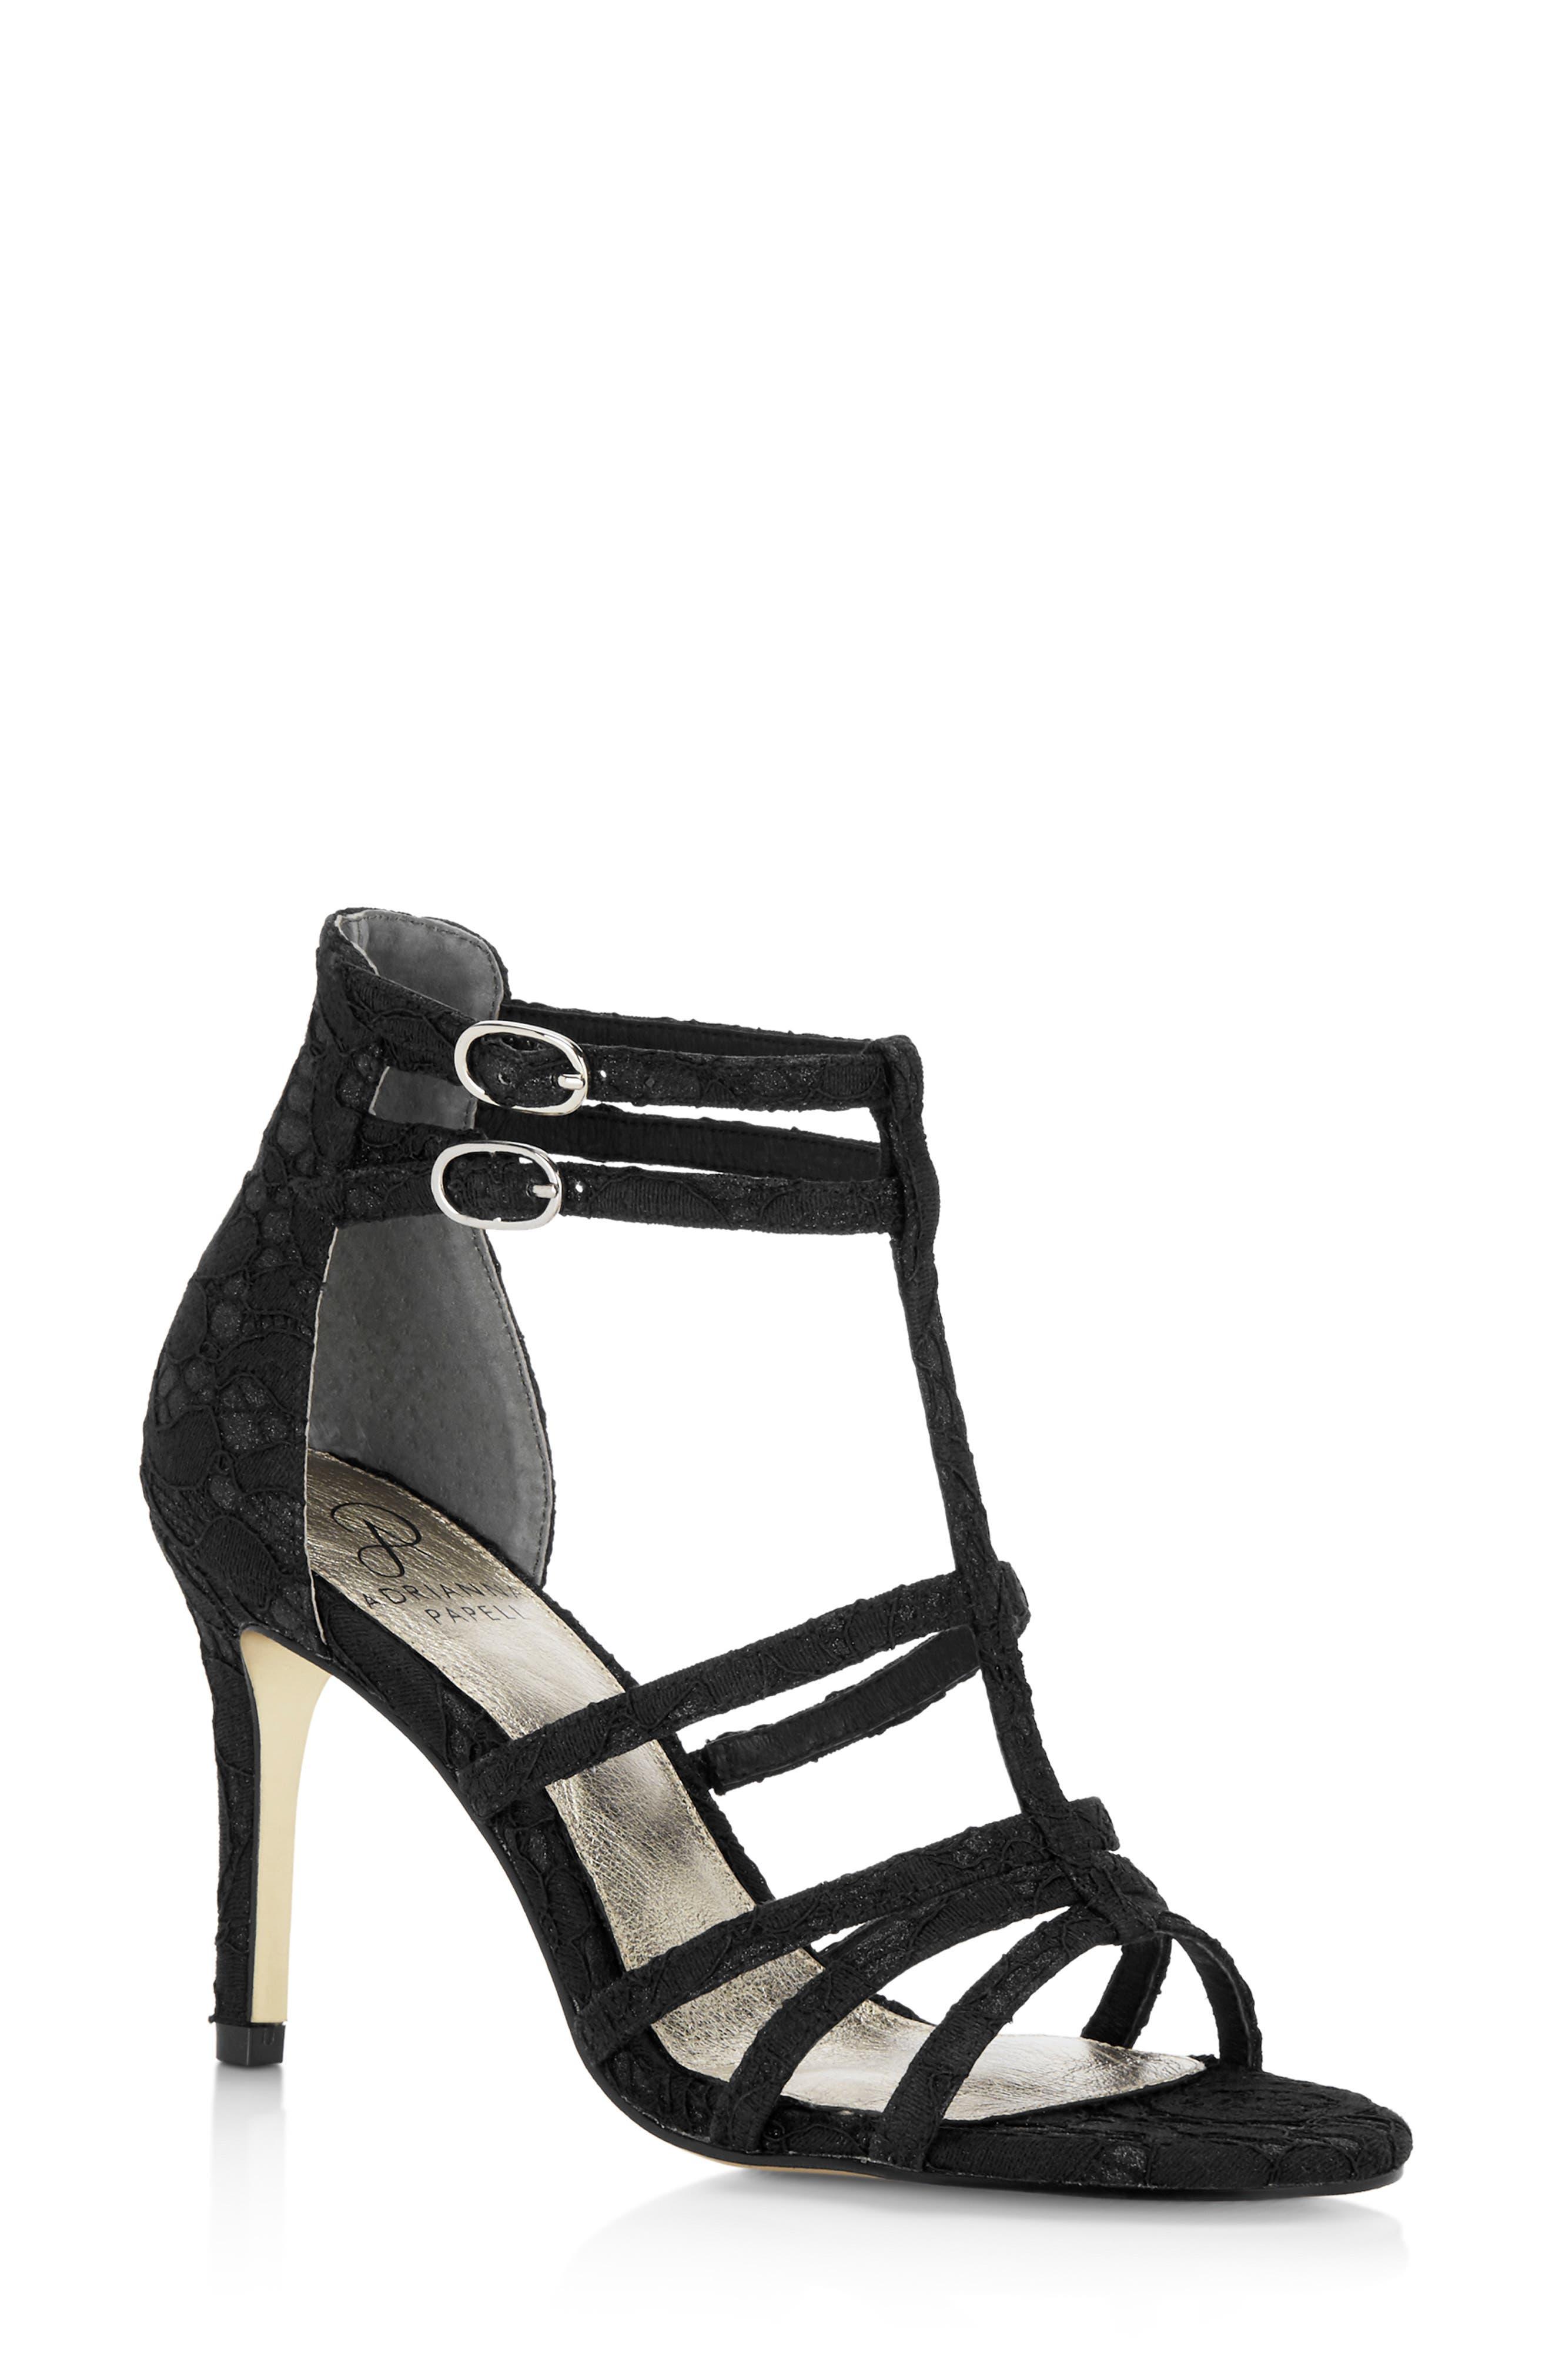 Adrianna Papell Adara Ankle Strap Sandal- Black